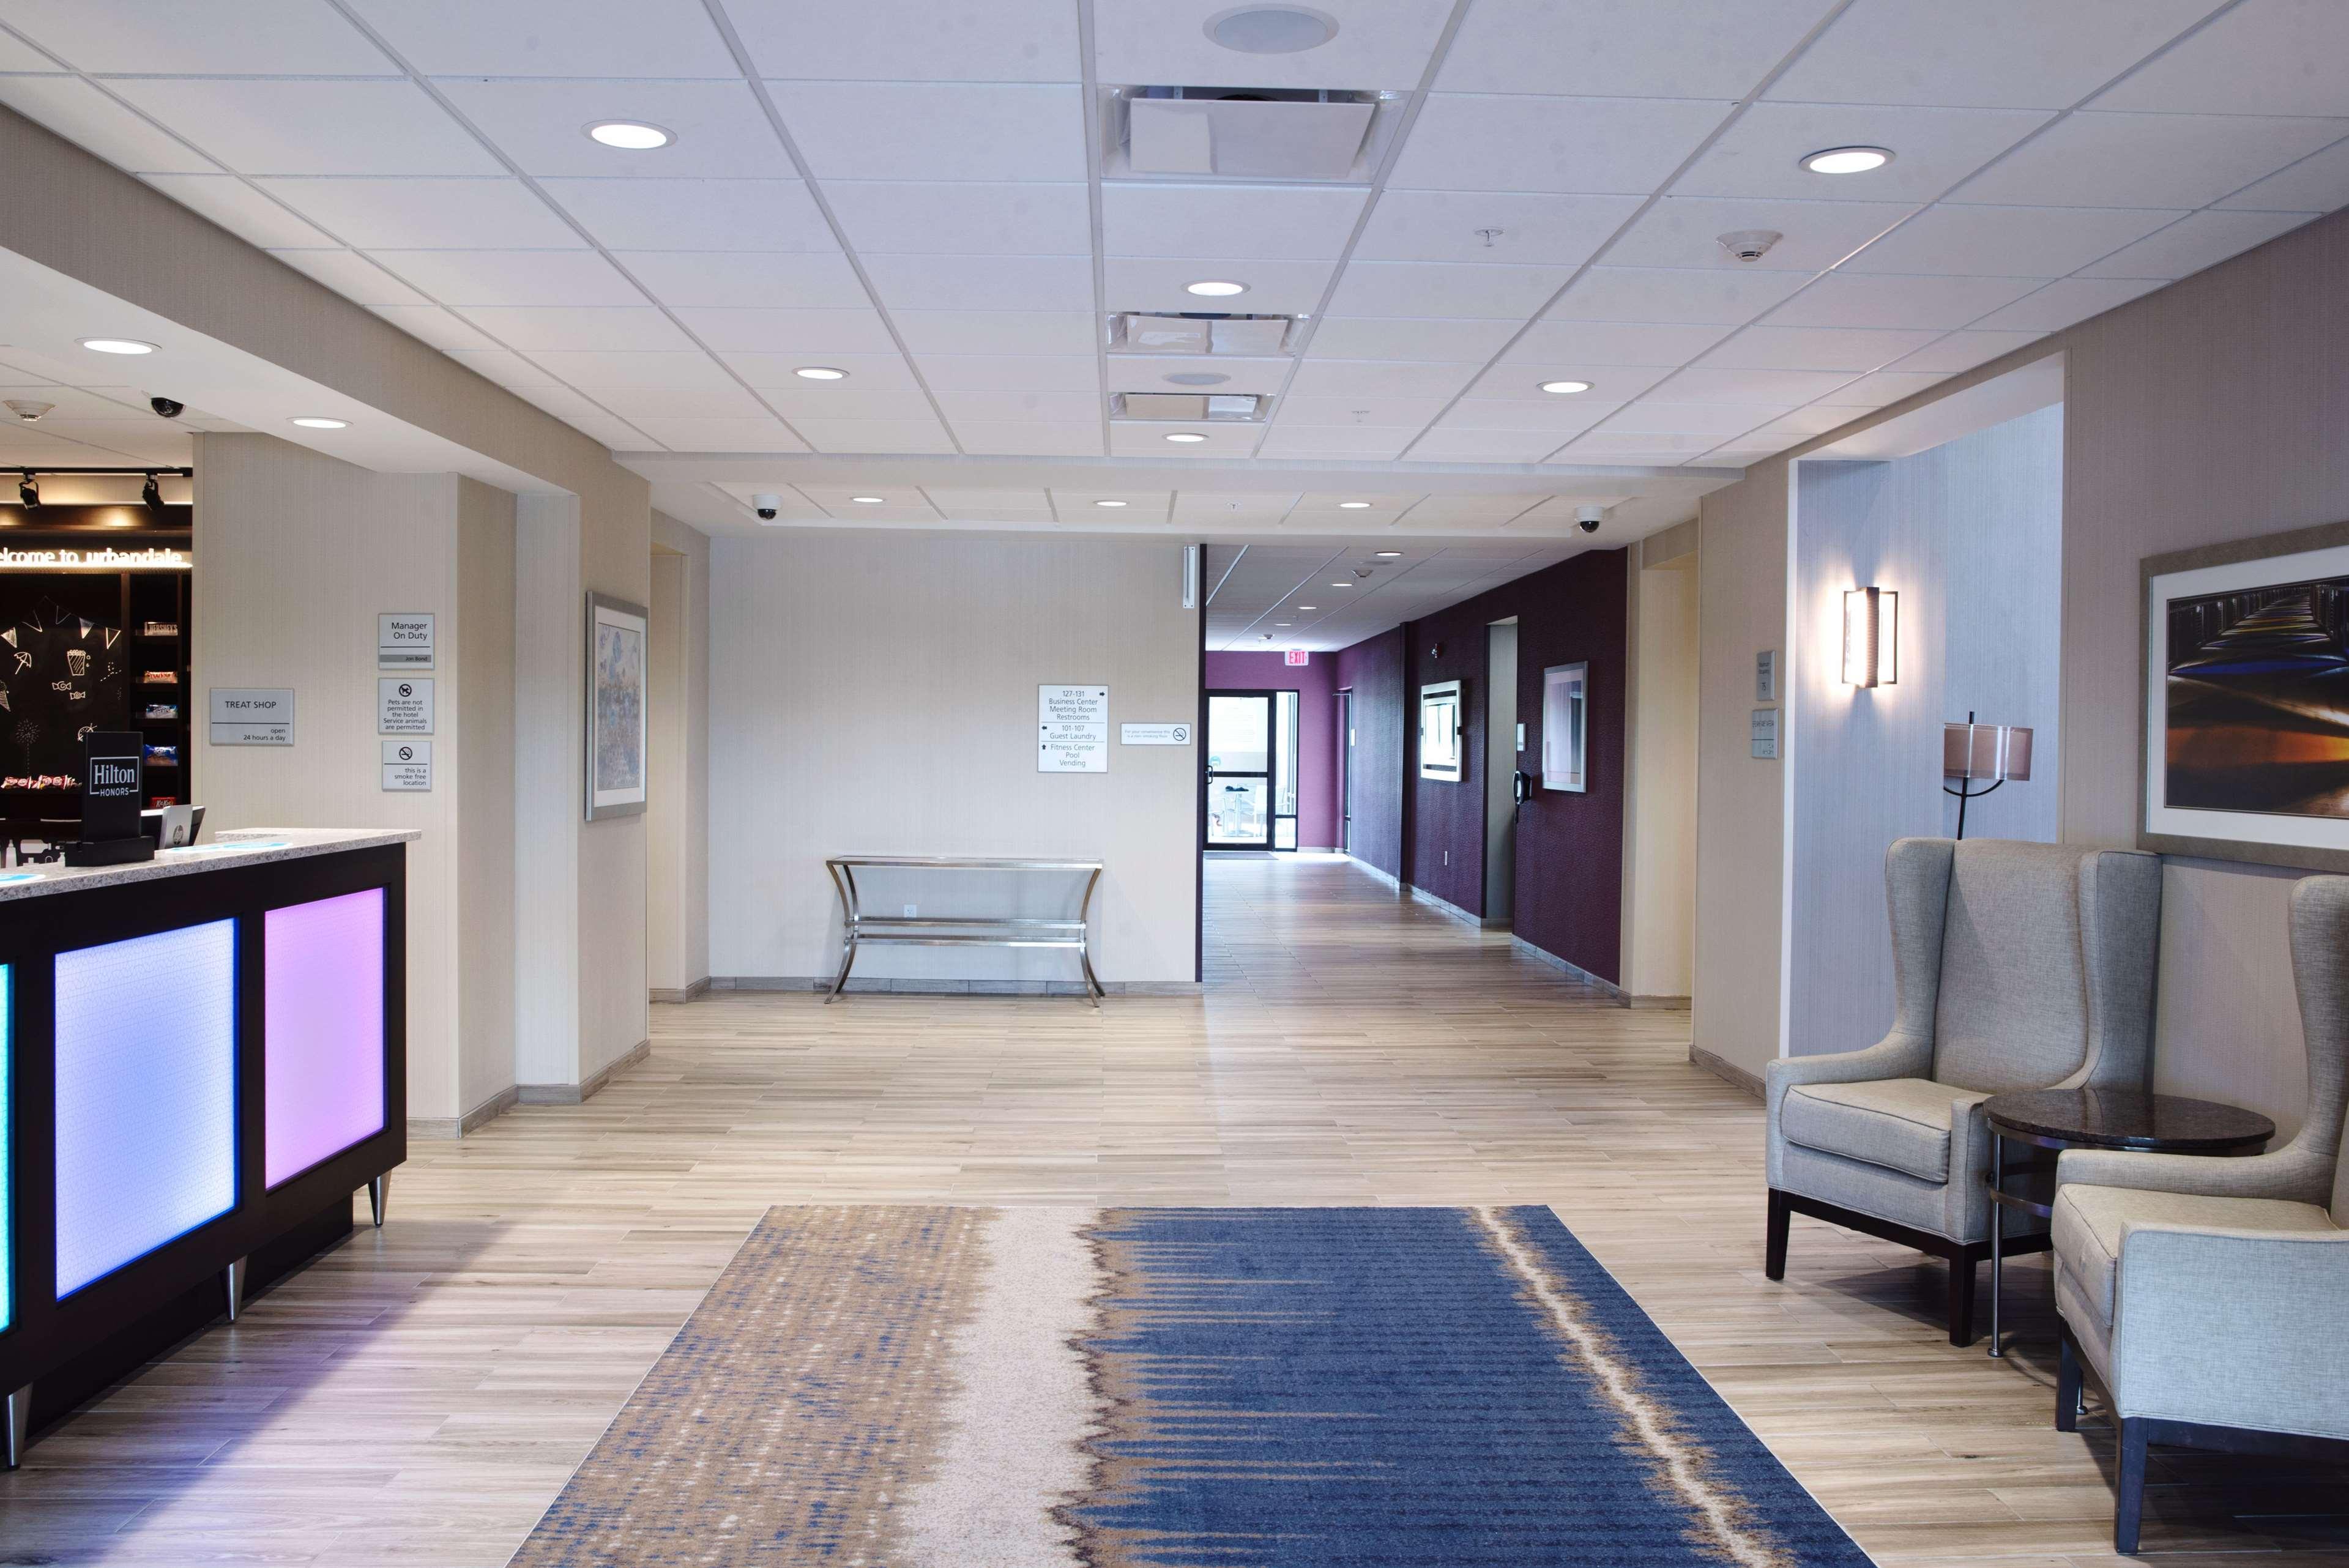 Hampton inn suites des moines urbandale urbandale iowa ia for Urbandale indoor swimming pool hours